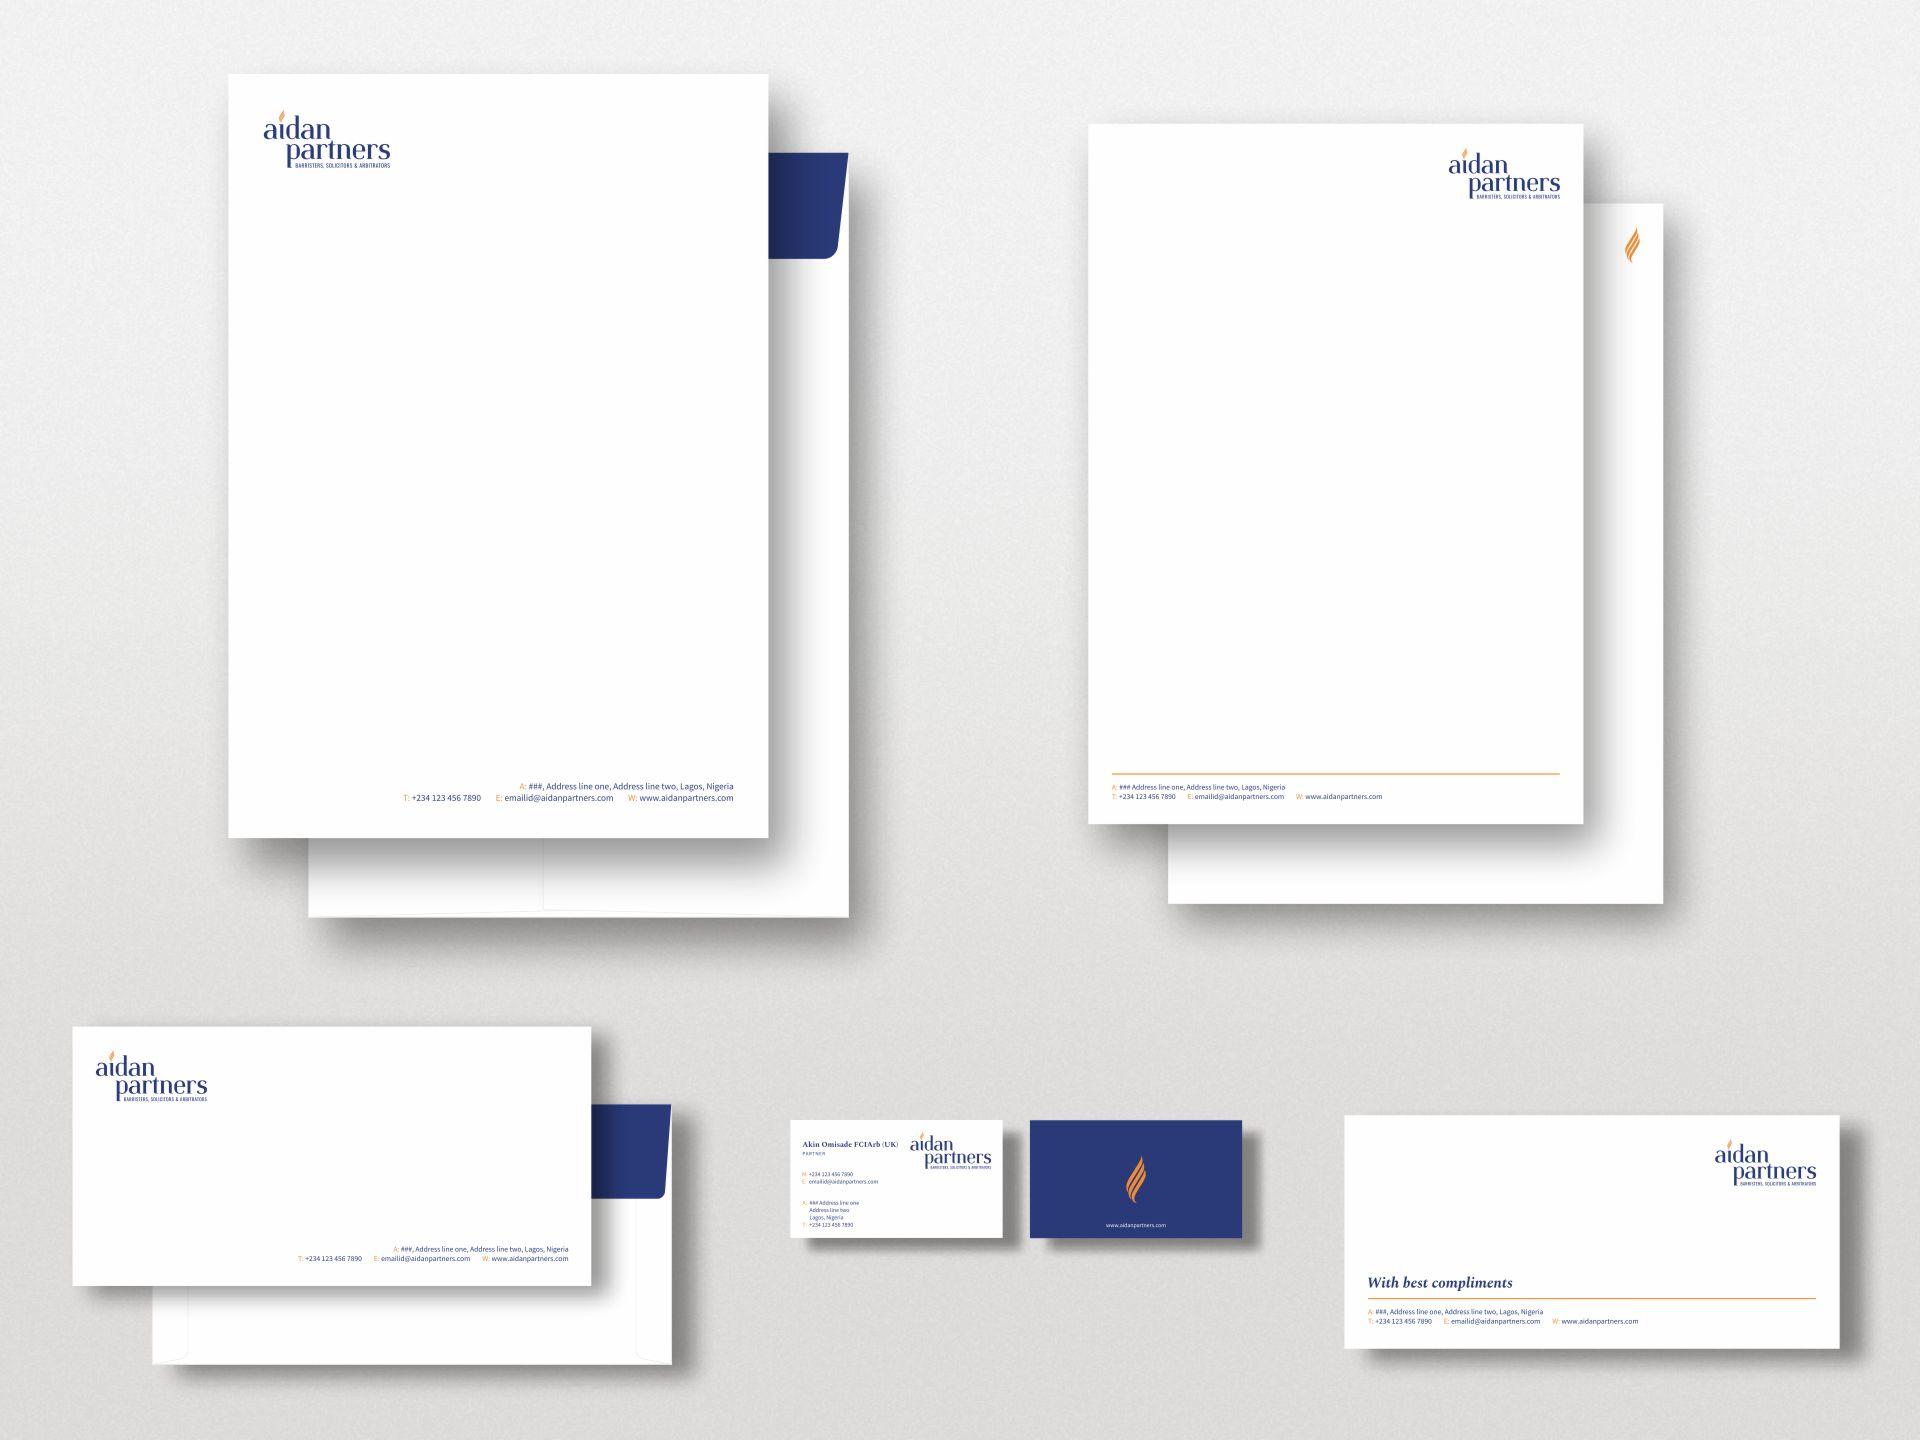 Aidan Partners - Stationery